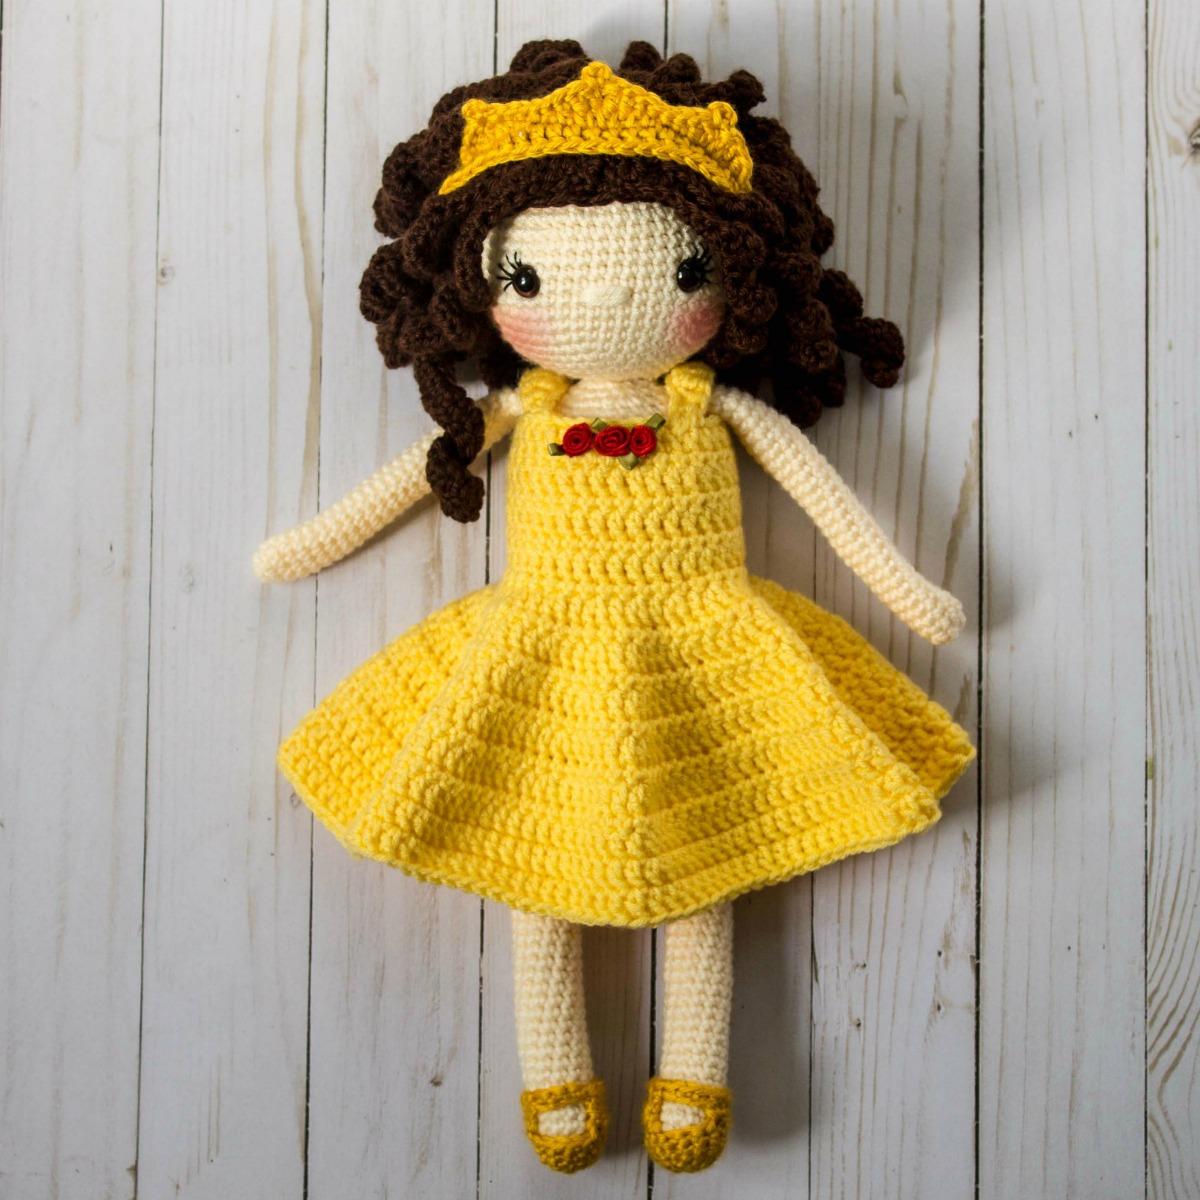 Honey Bunny Amigurumi Dress-Up Doll with Garden Play Mat: Crochet ...   1200x1200